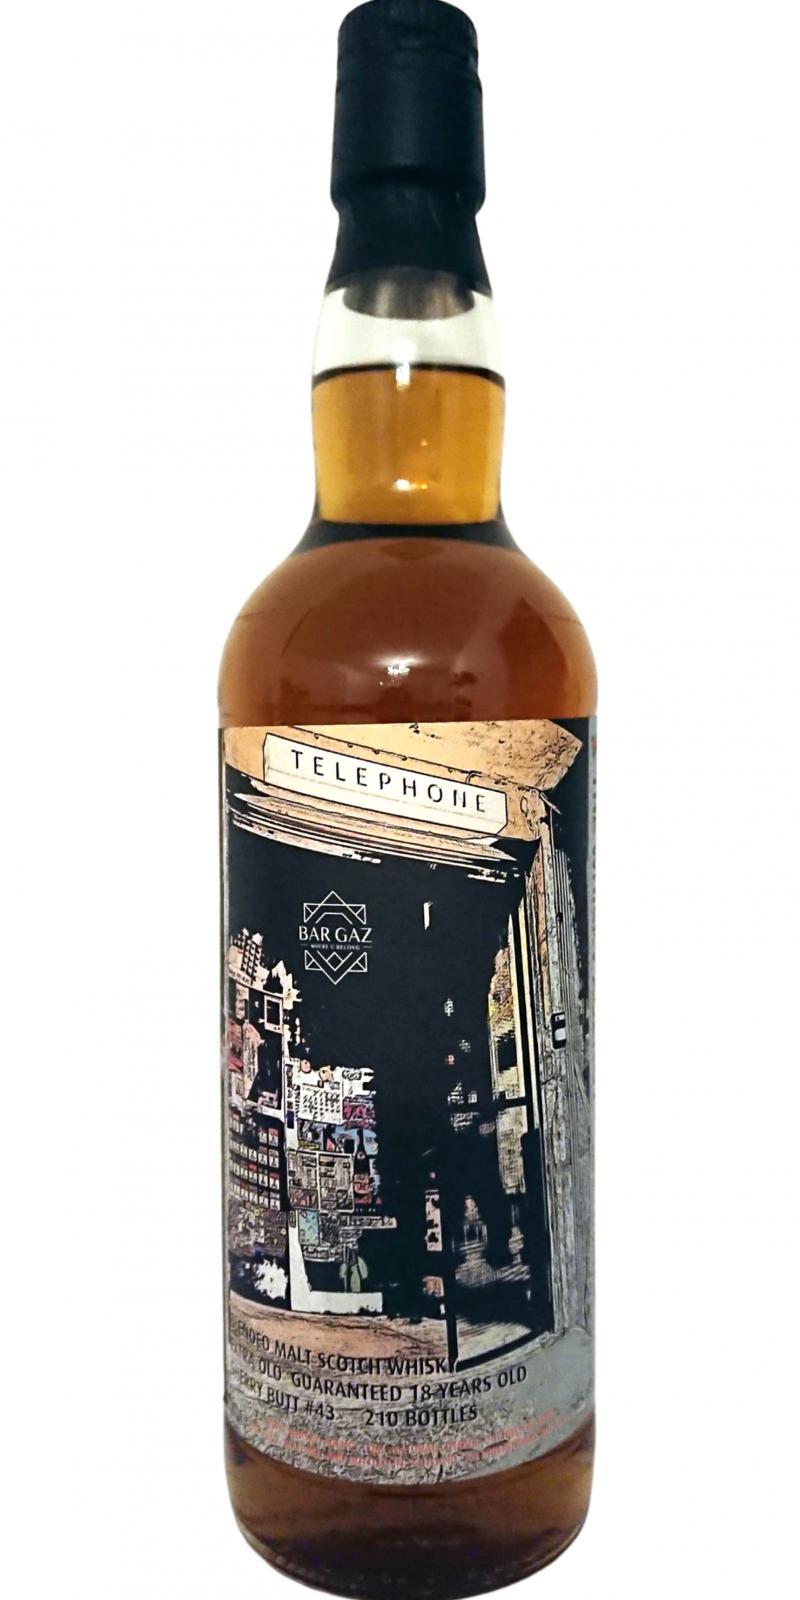 Blended Malt Scotch Whisky 18-year-old TWA